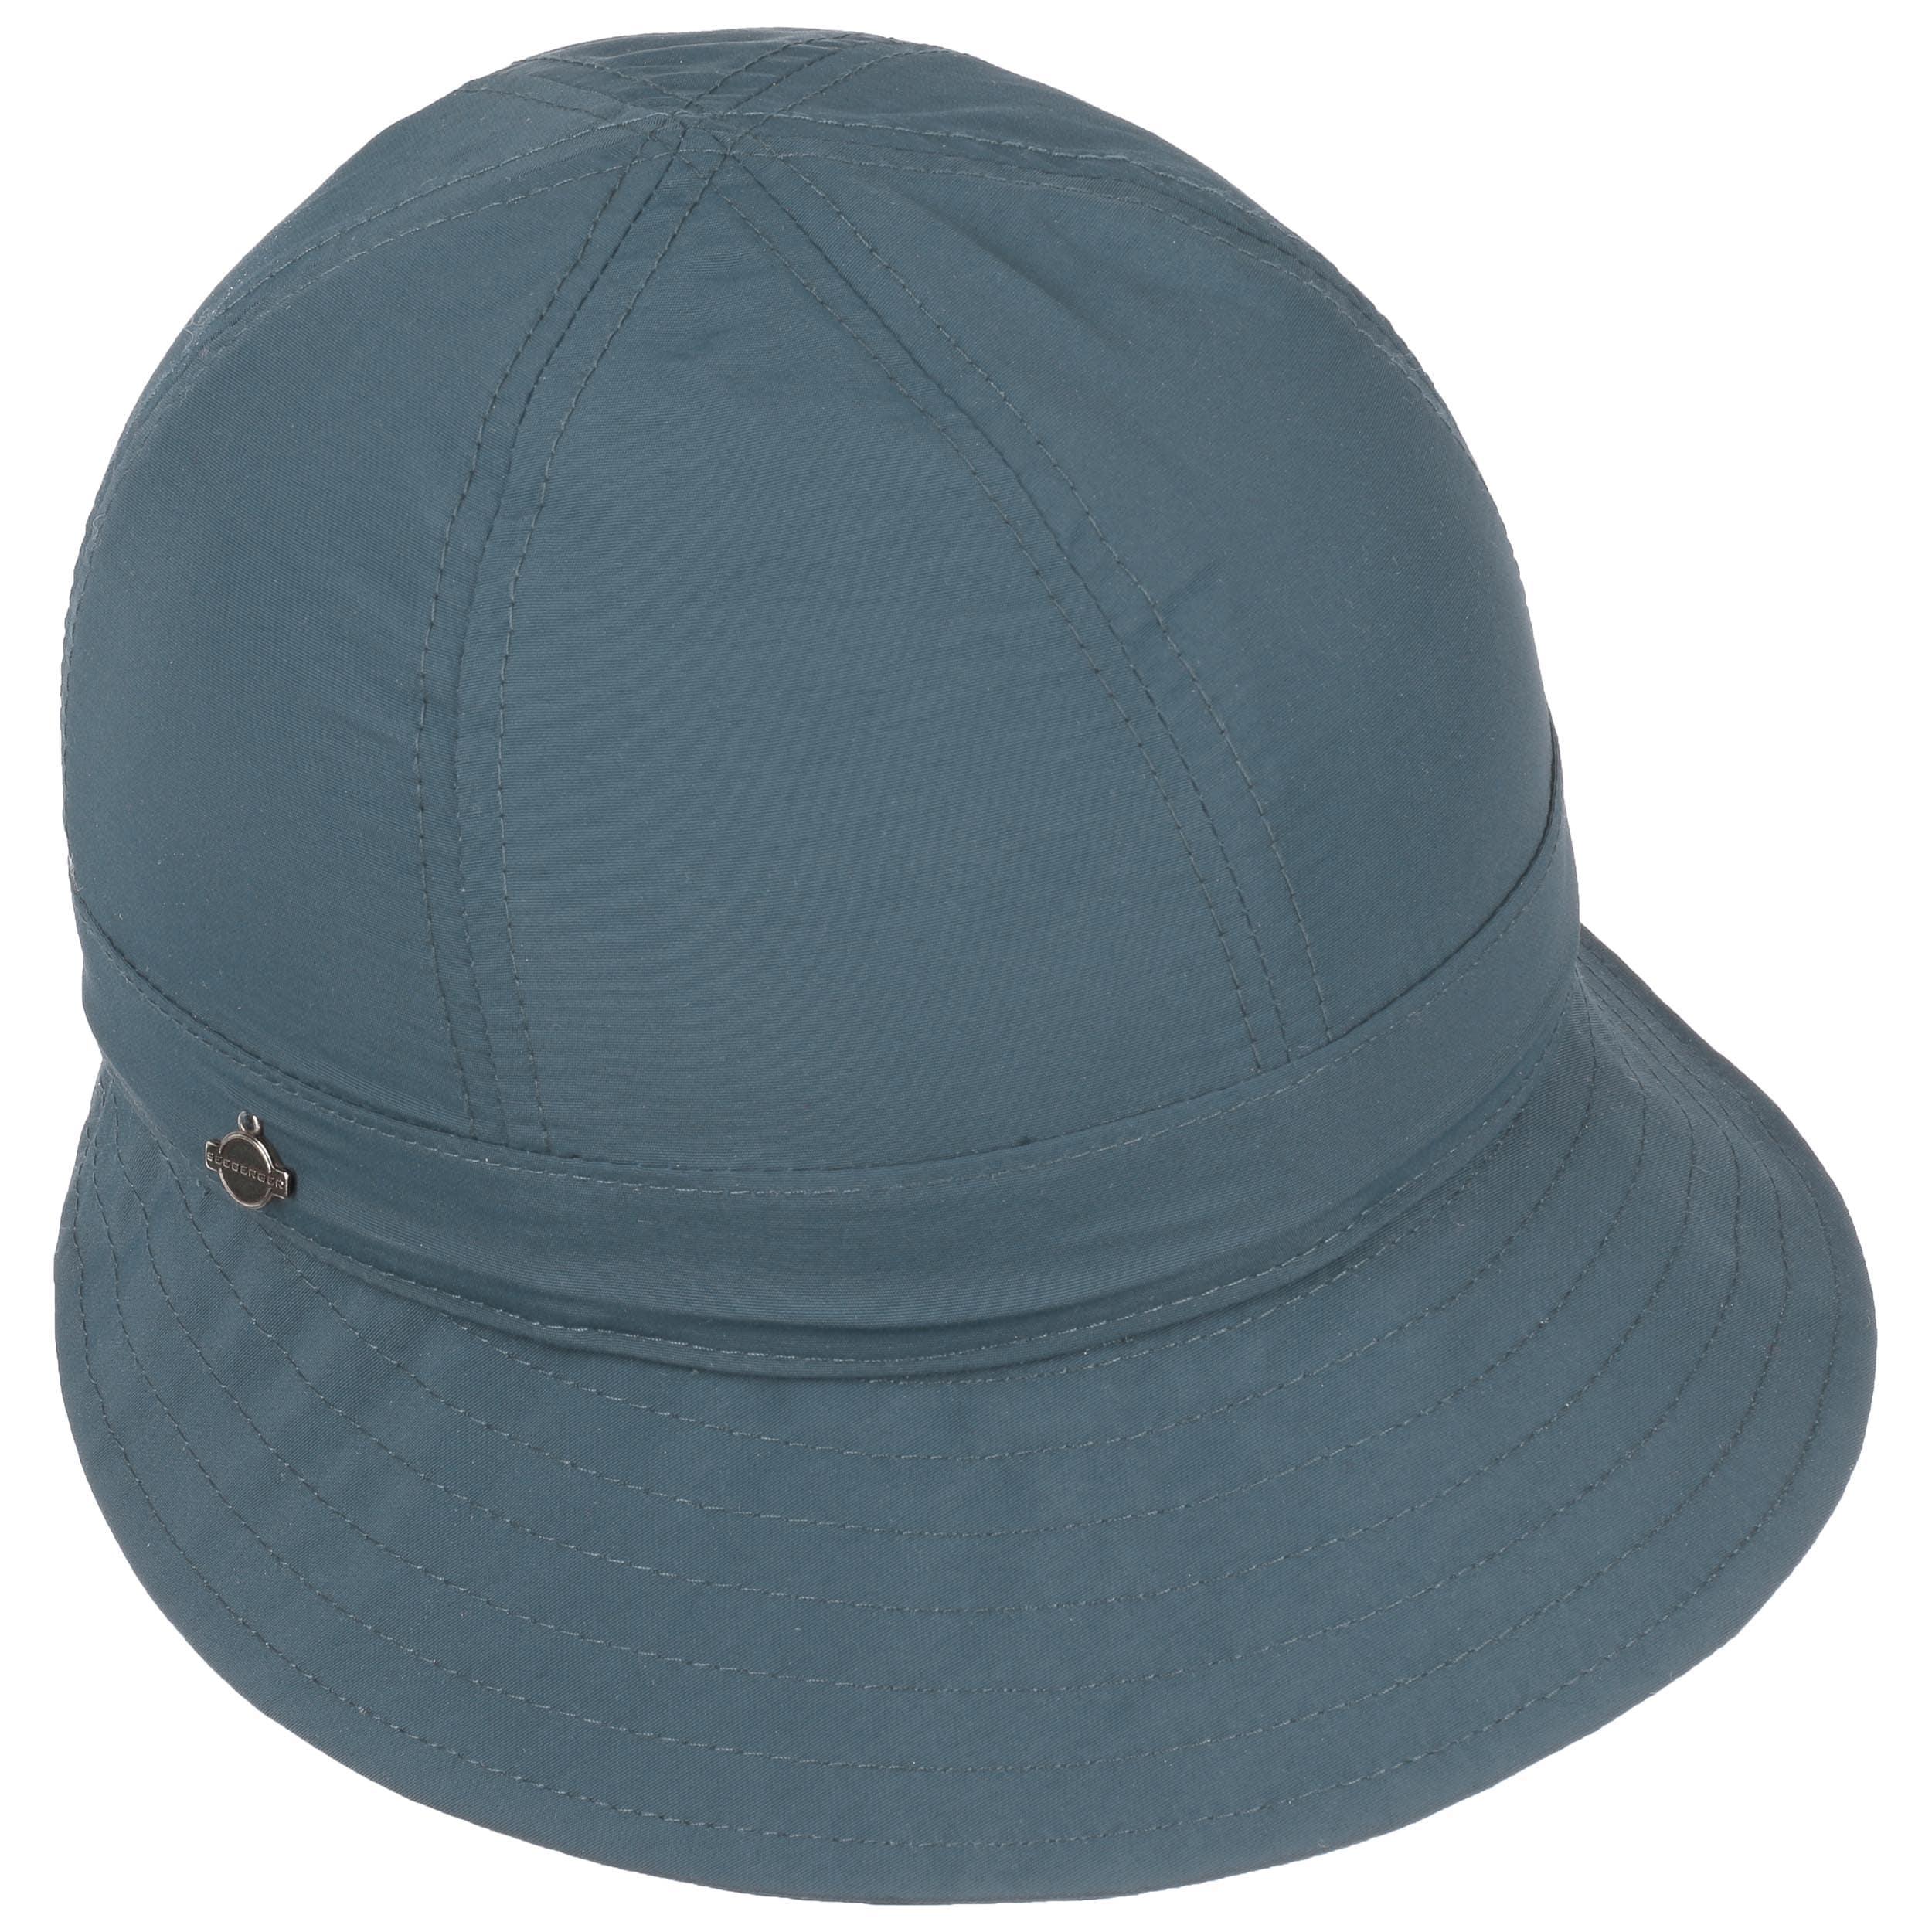 ... Uni Anti-Rain Cloche Hat by Seeberger - blue 1 ... fd61ec313e0